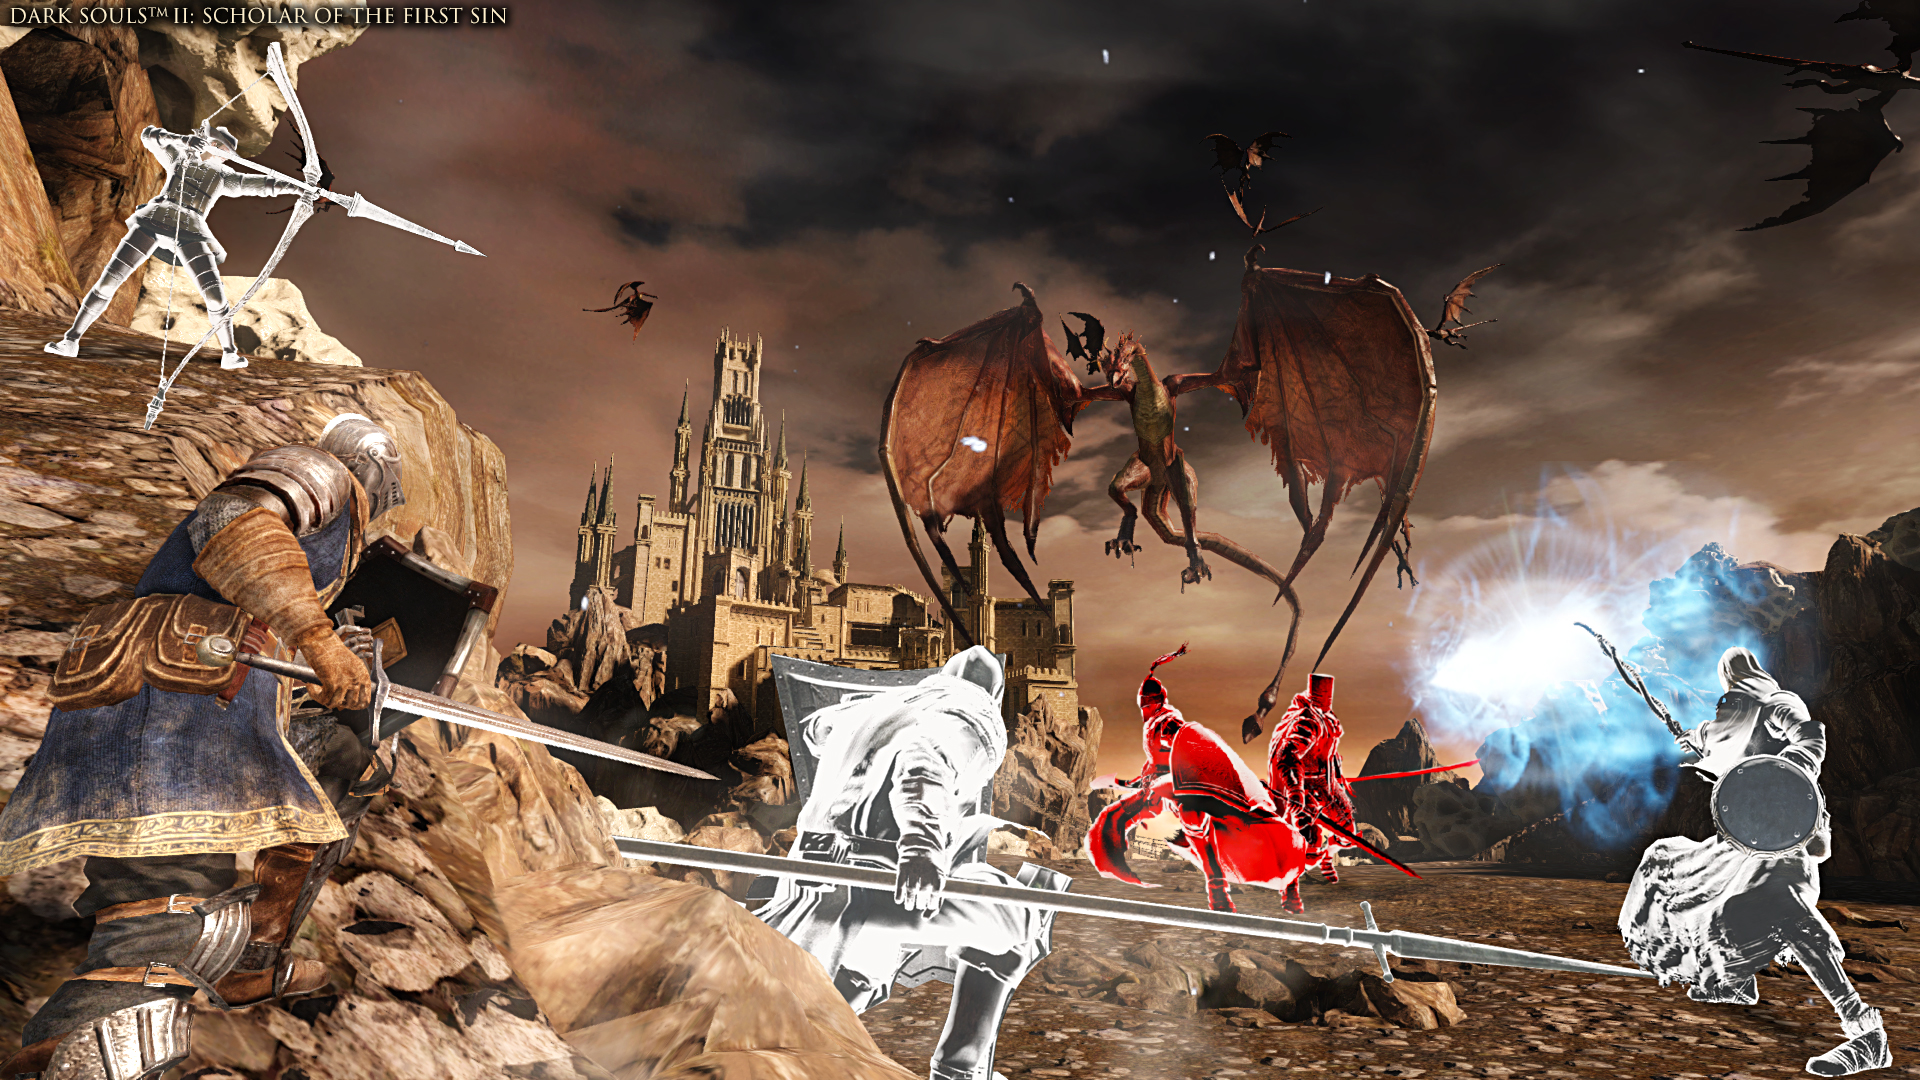 Quelle: Bandai Namco - Dark Souls II: Scholar of The First Sin